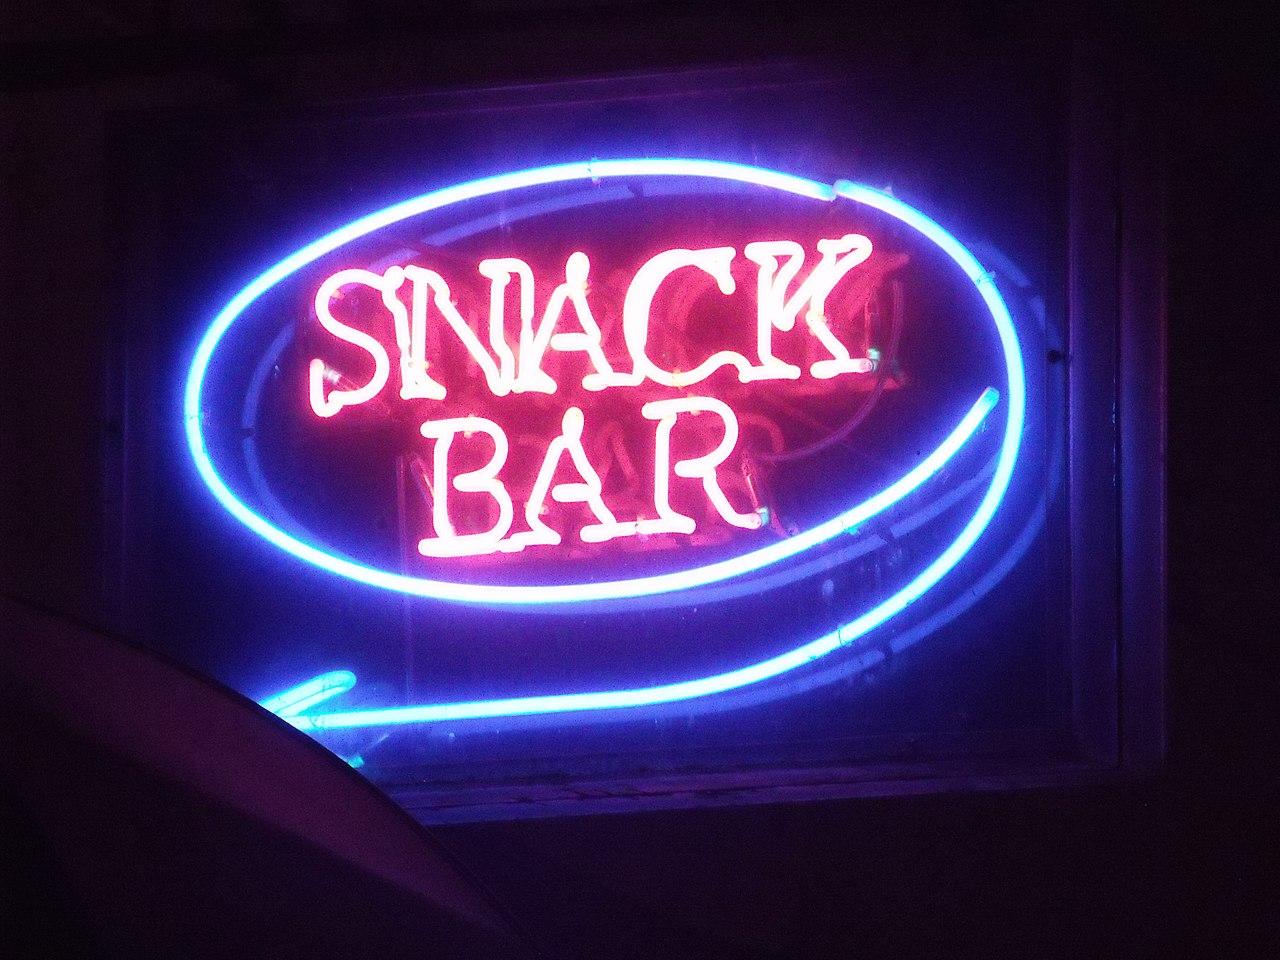 FileSnack Bar  Aldwych London  Neon signs 6447495729